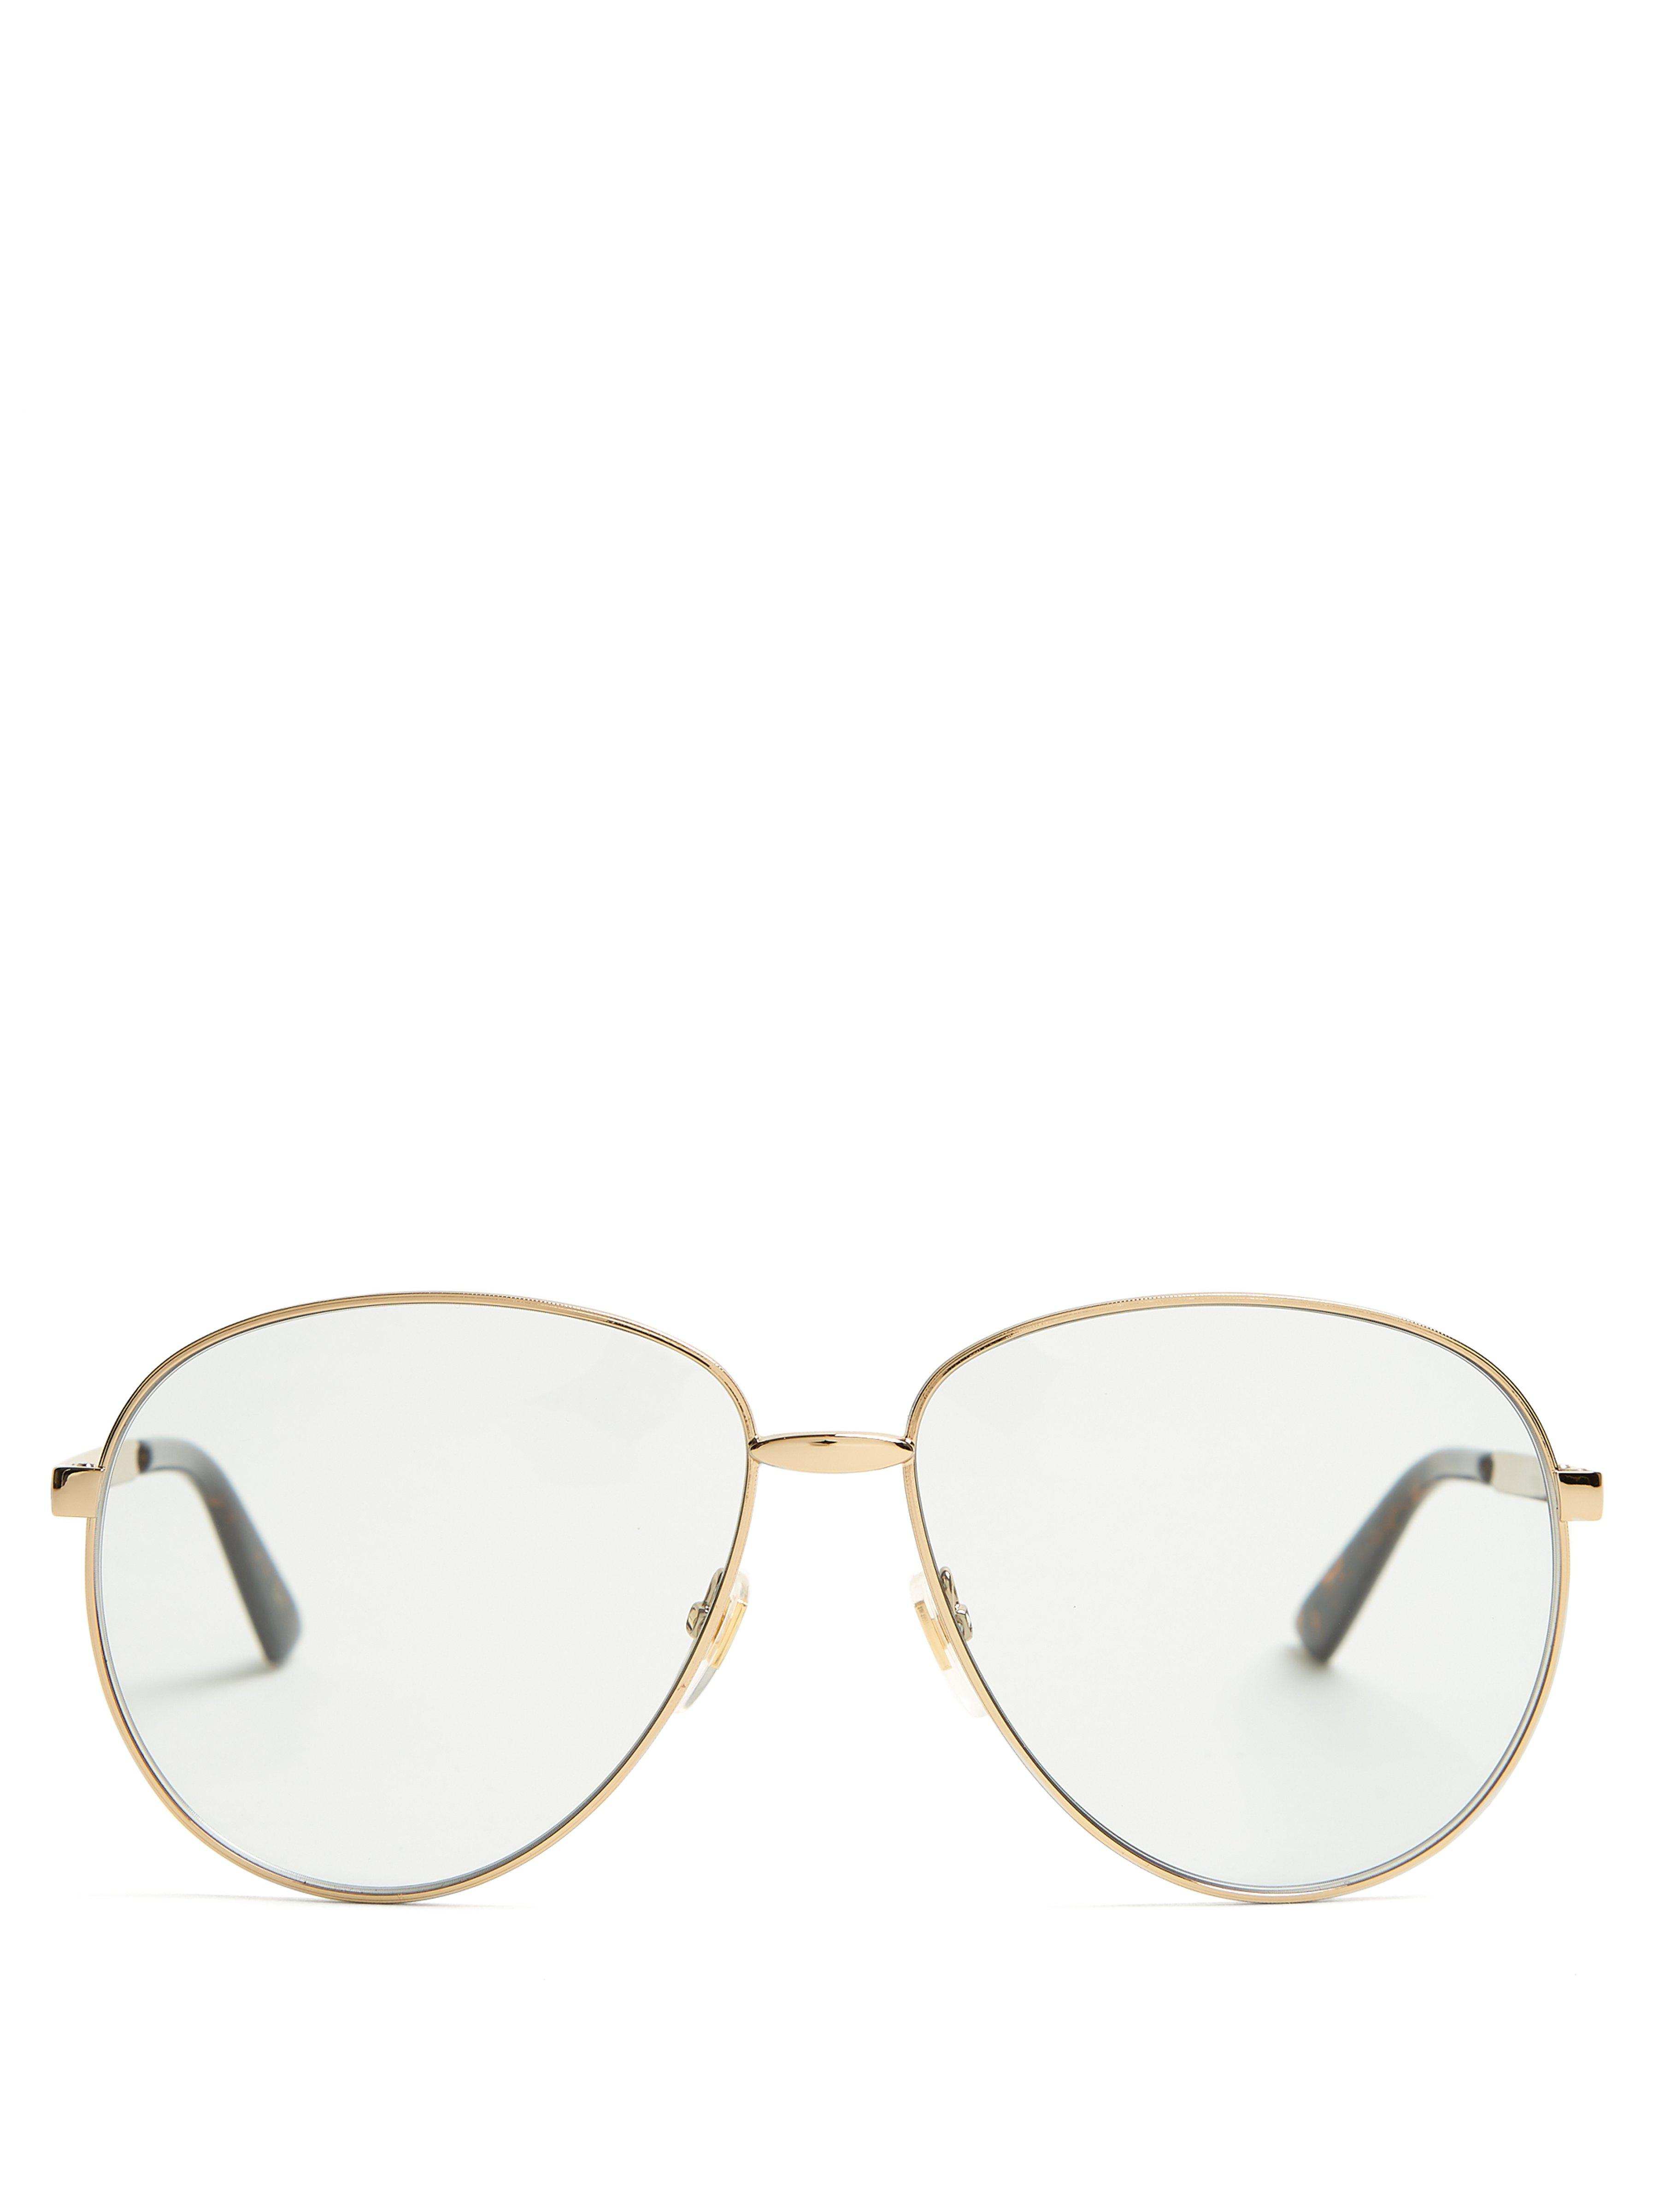 fc4ebc7e827c6 Gucci Aviator Glasses With Web in Metallic for Men - Save 6% - Lyst